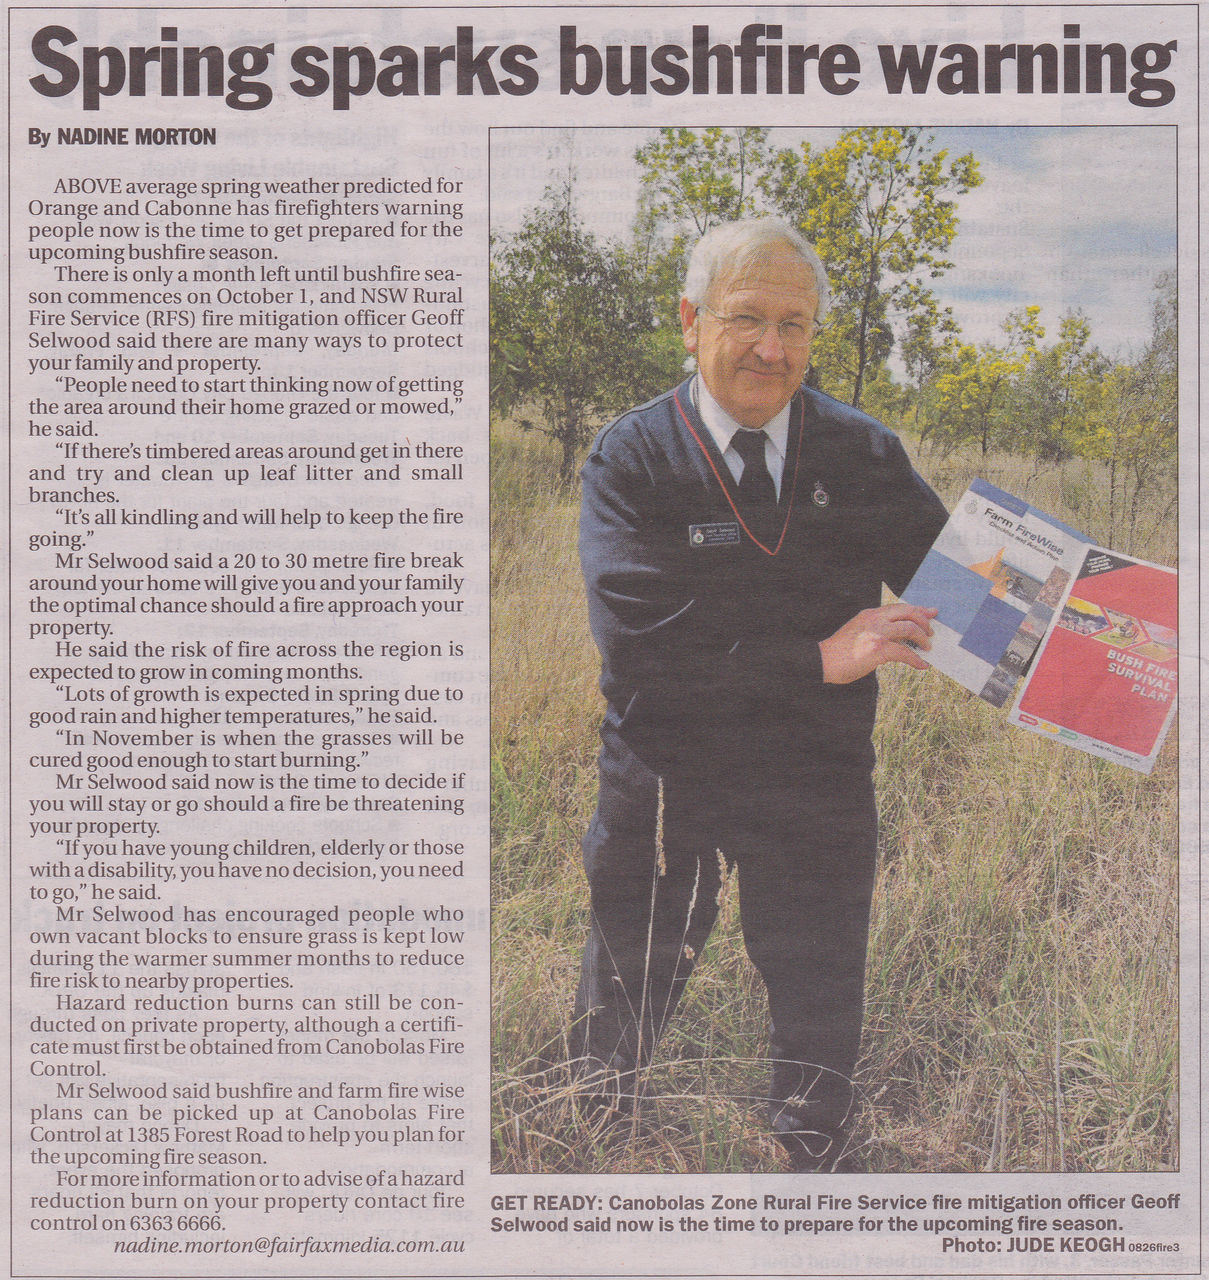 Spring sparks bush fire warning